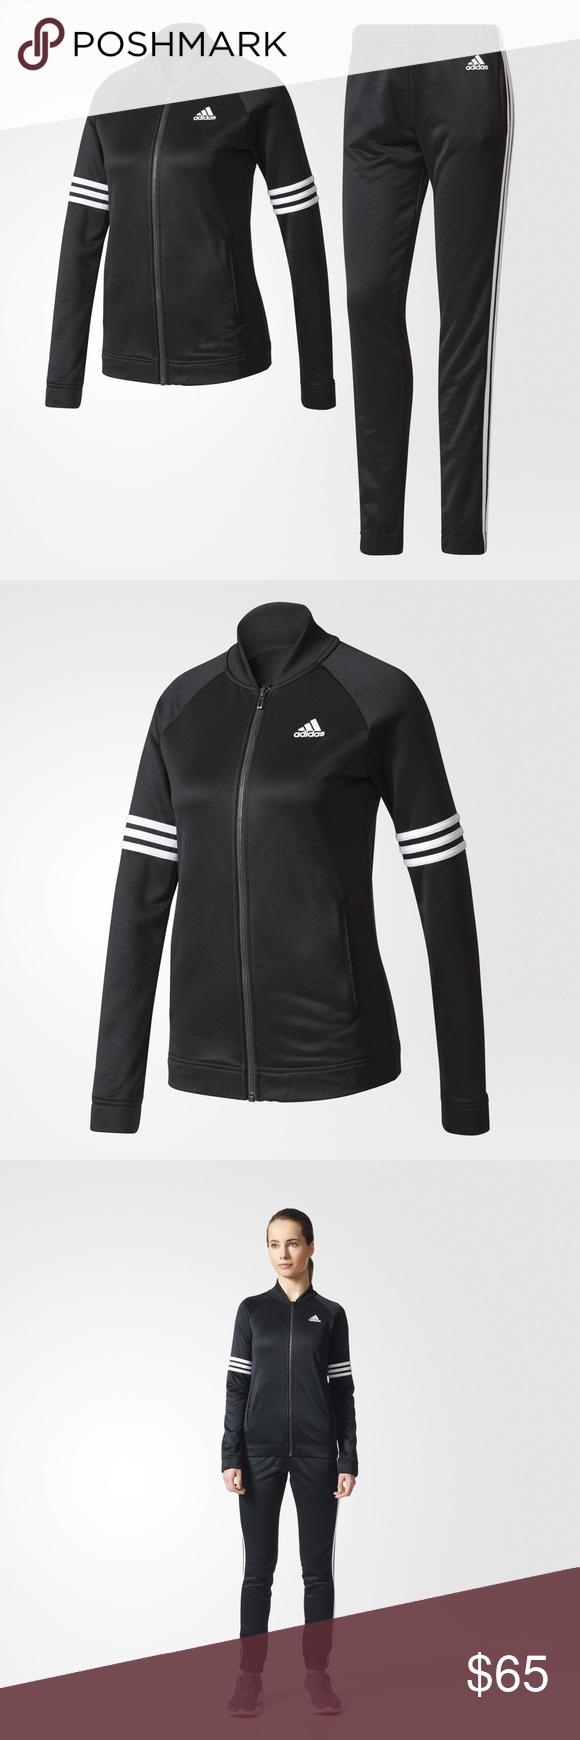 d4d72167495 Coming Soon NWT Adidas Black Cozy Track Suit Set Coming Soon NWT Adidas  Cozy Track Suit